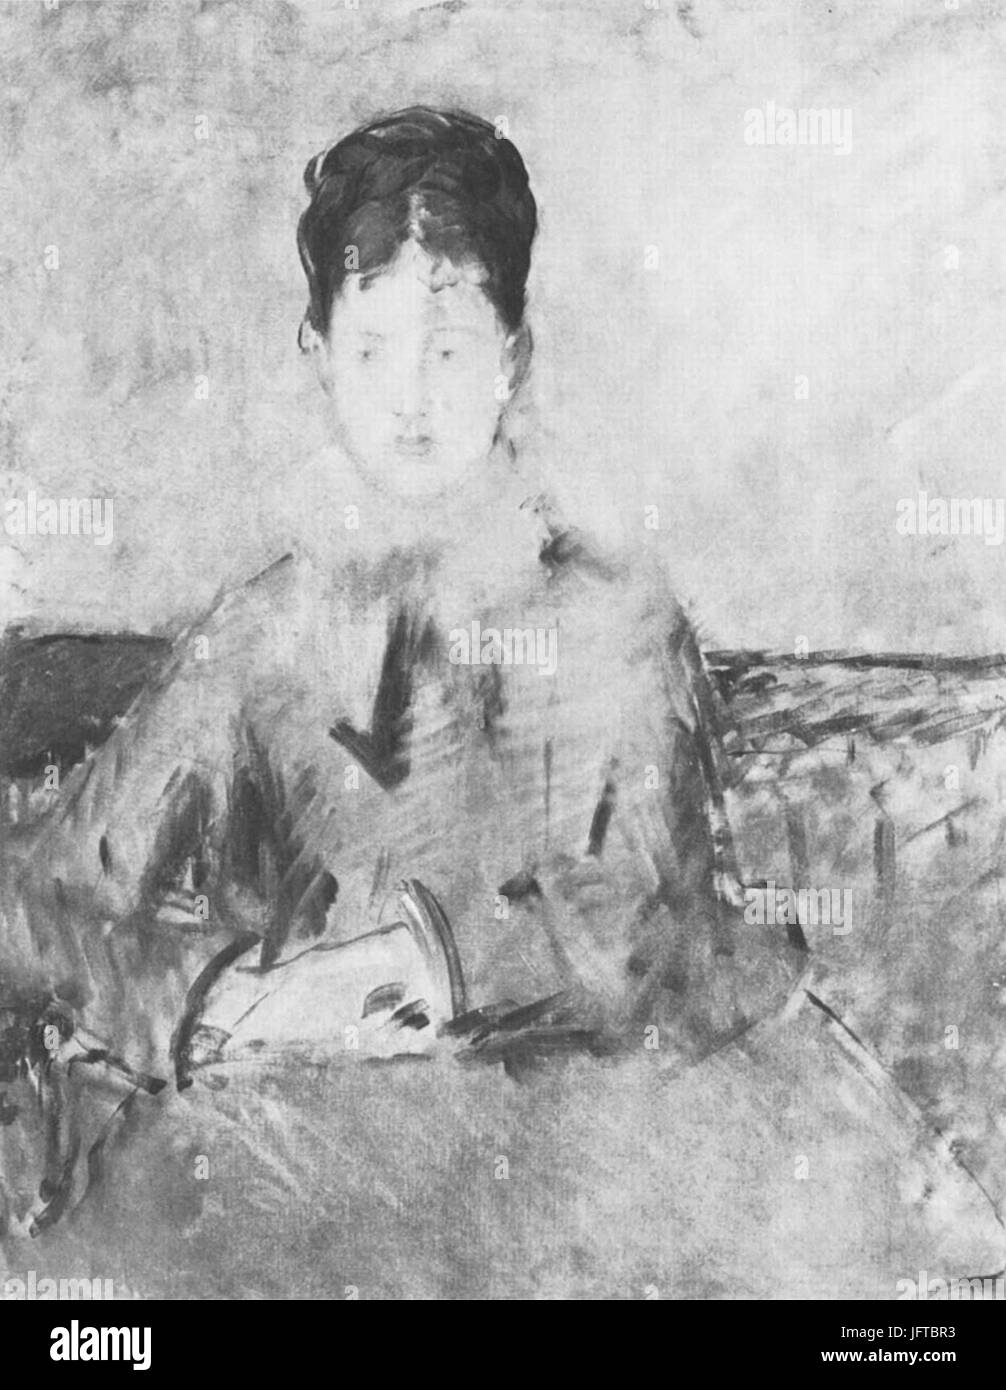 Édouard Manet - Femme (RW 333) - Stock Image